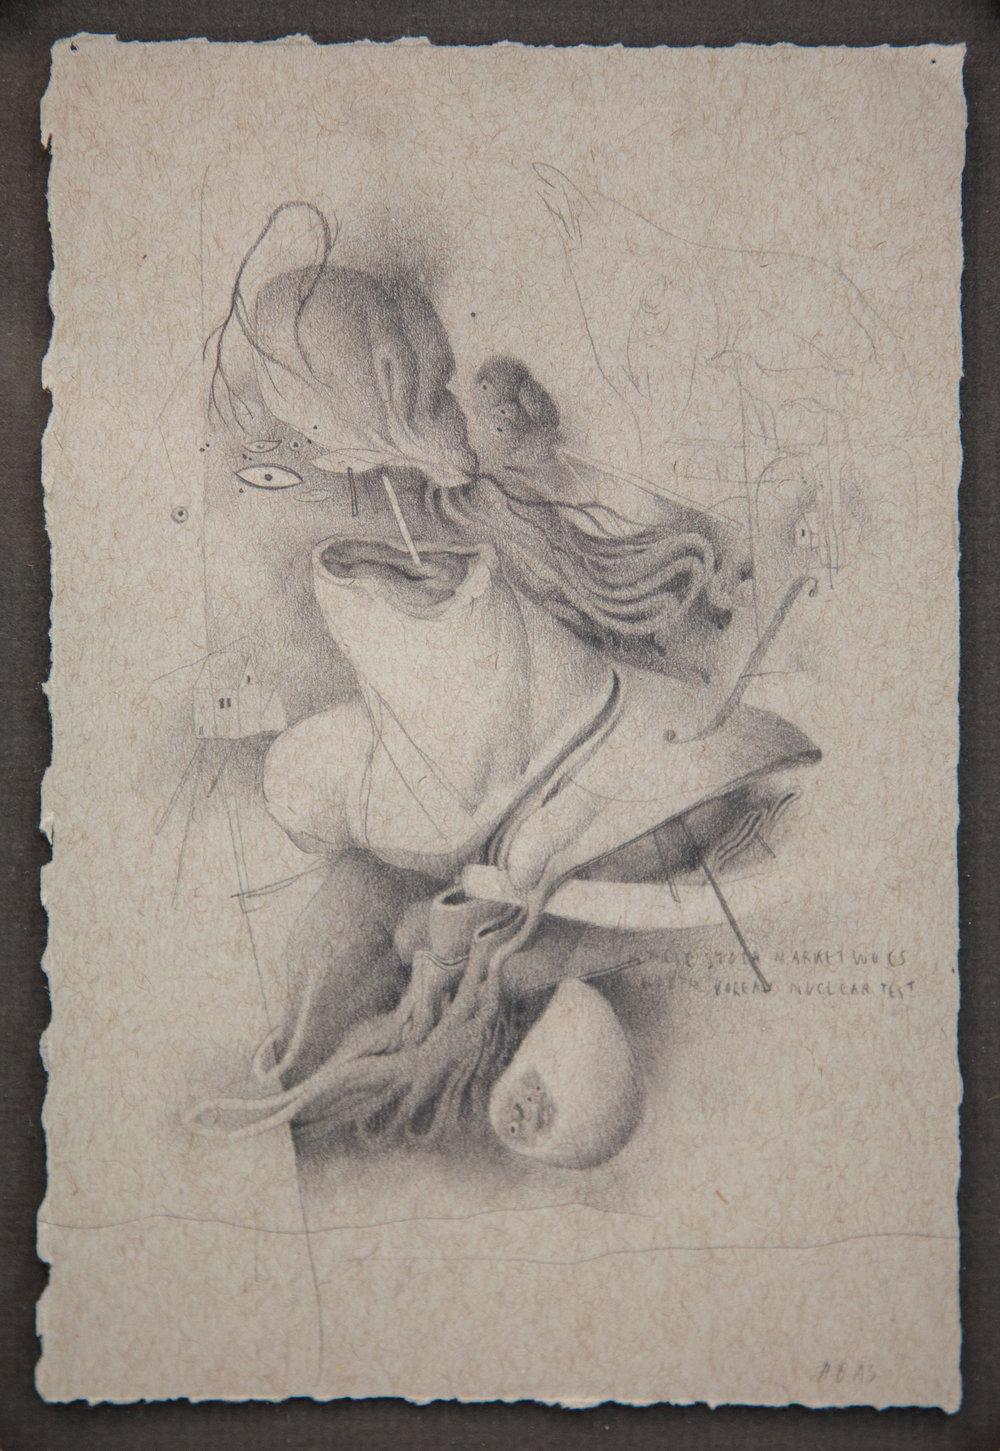 A W Sommers - Untitled Graphite Piece - 13.5x16 crop.jpg